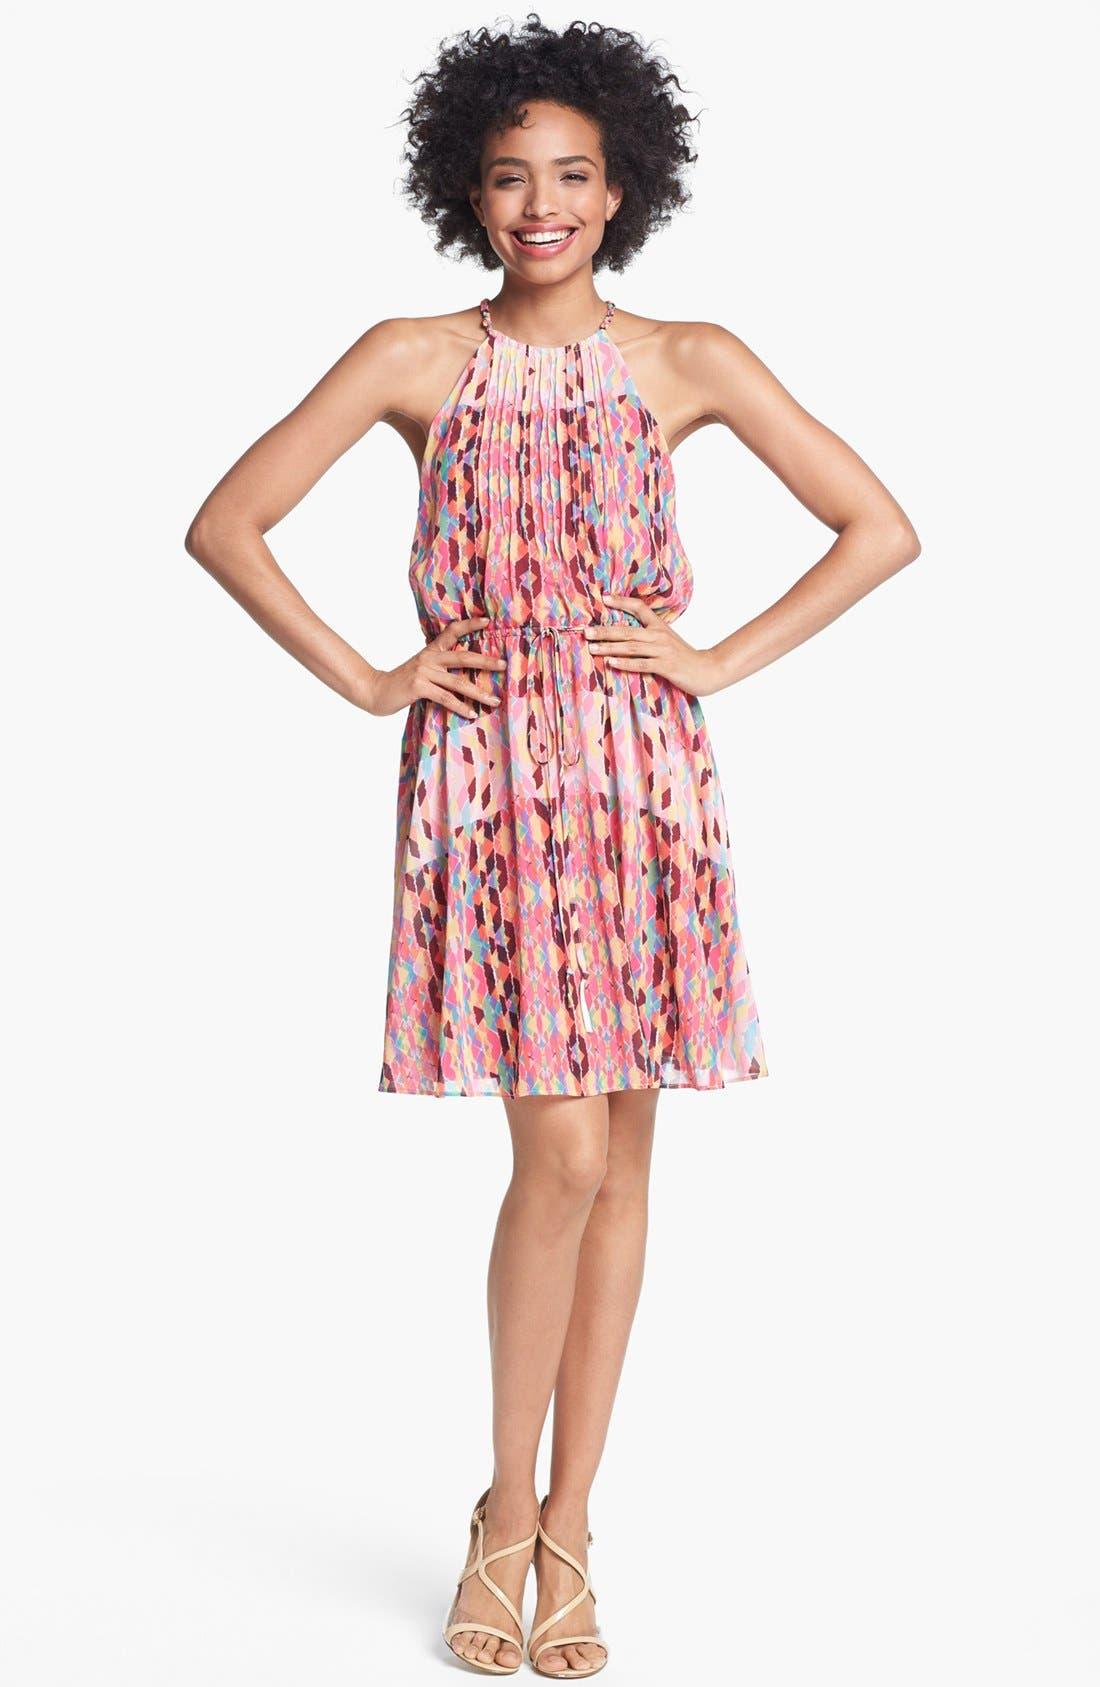 Alternate Image 1 Selected - Jessica Simpson Print Pintucked Chiffon Dress